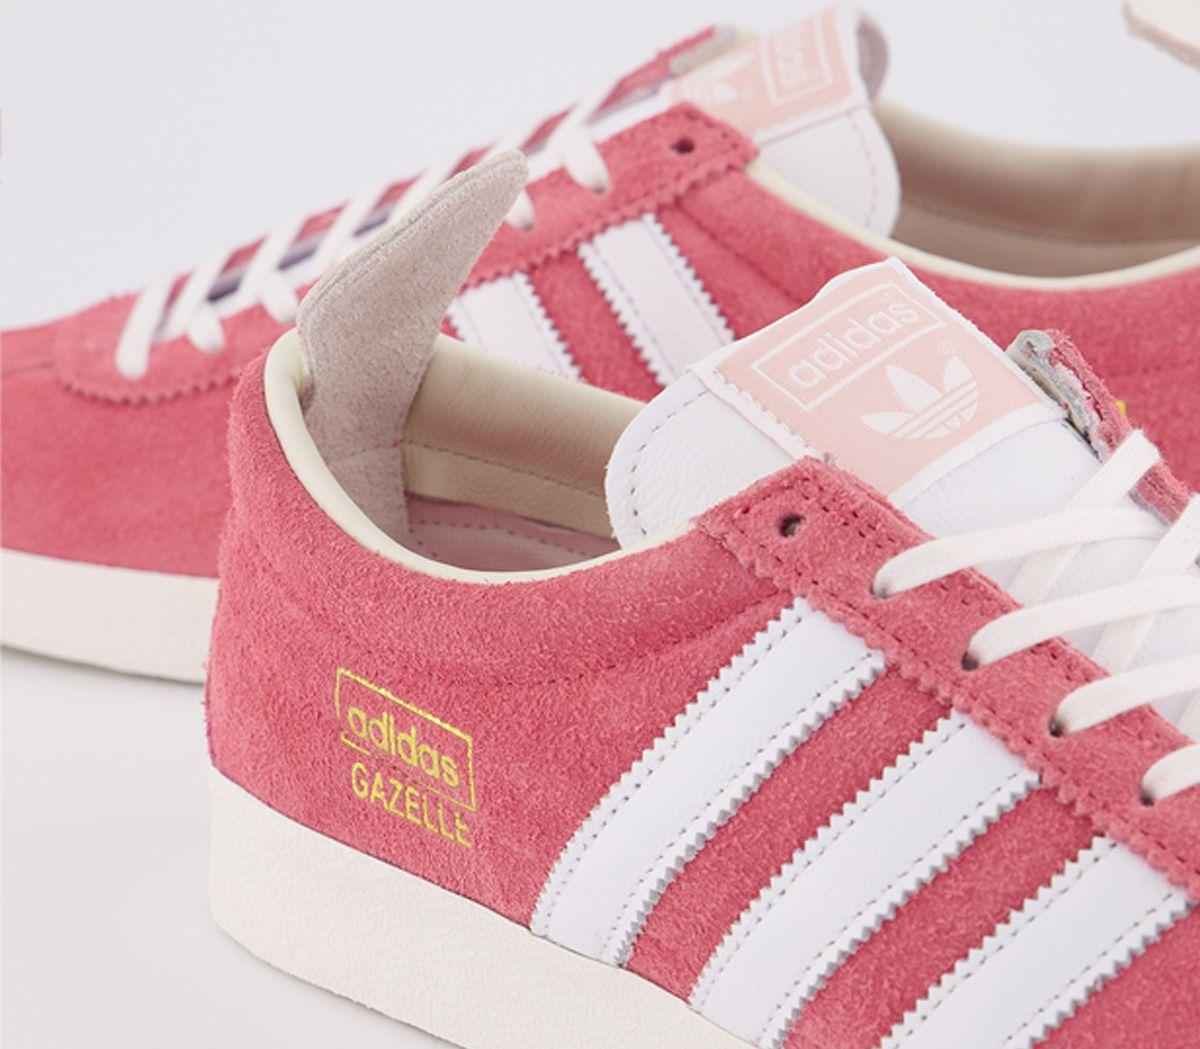 Adidas-Gazelle-Vintage-Baskets-Real-Rose-Blanc-Blanc-Baskets-Chaussures miniature 3